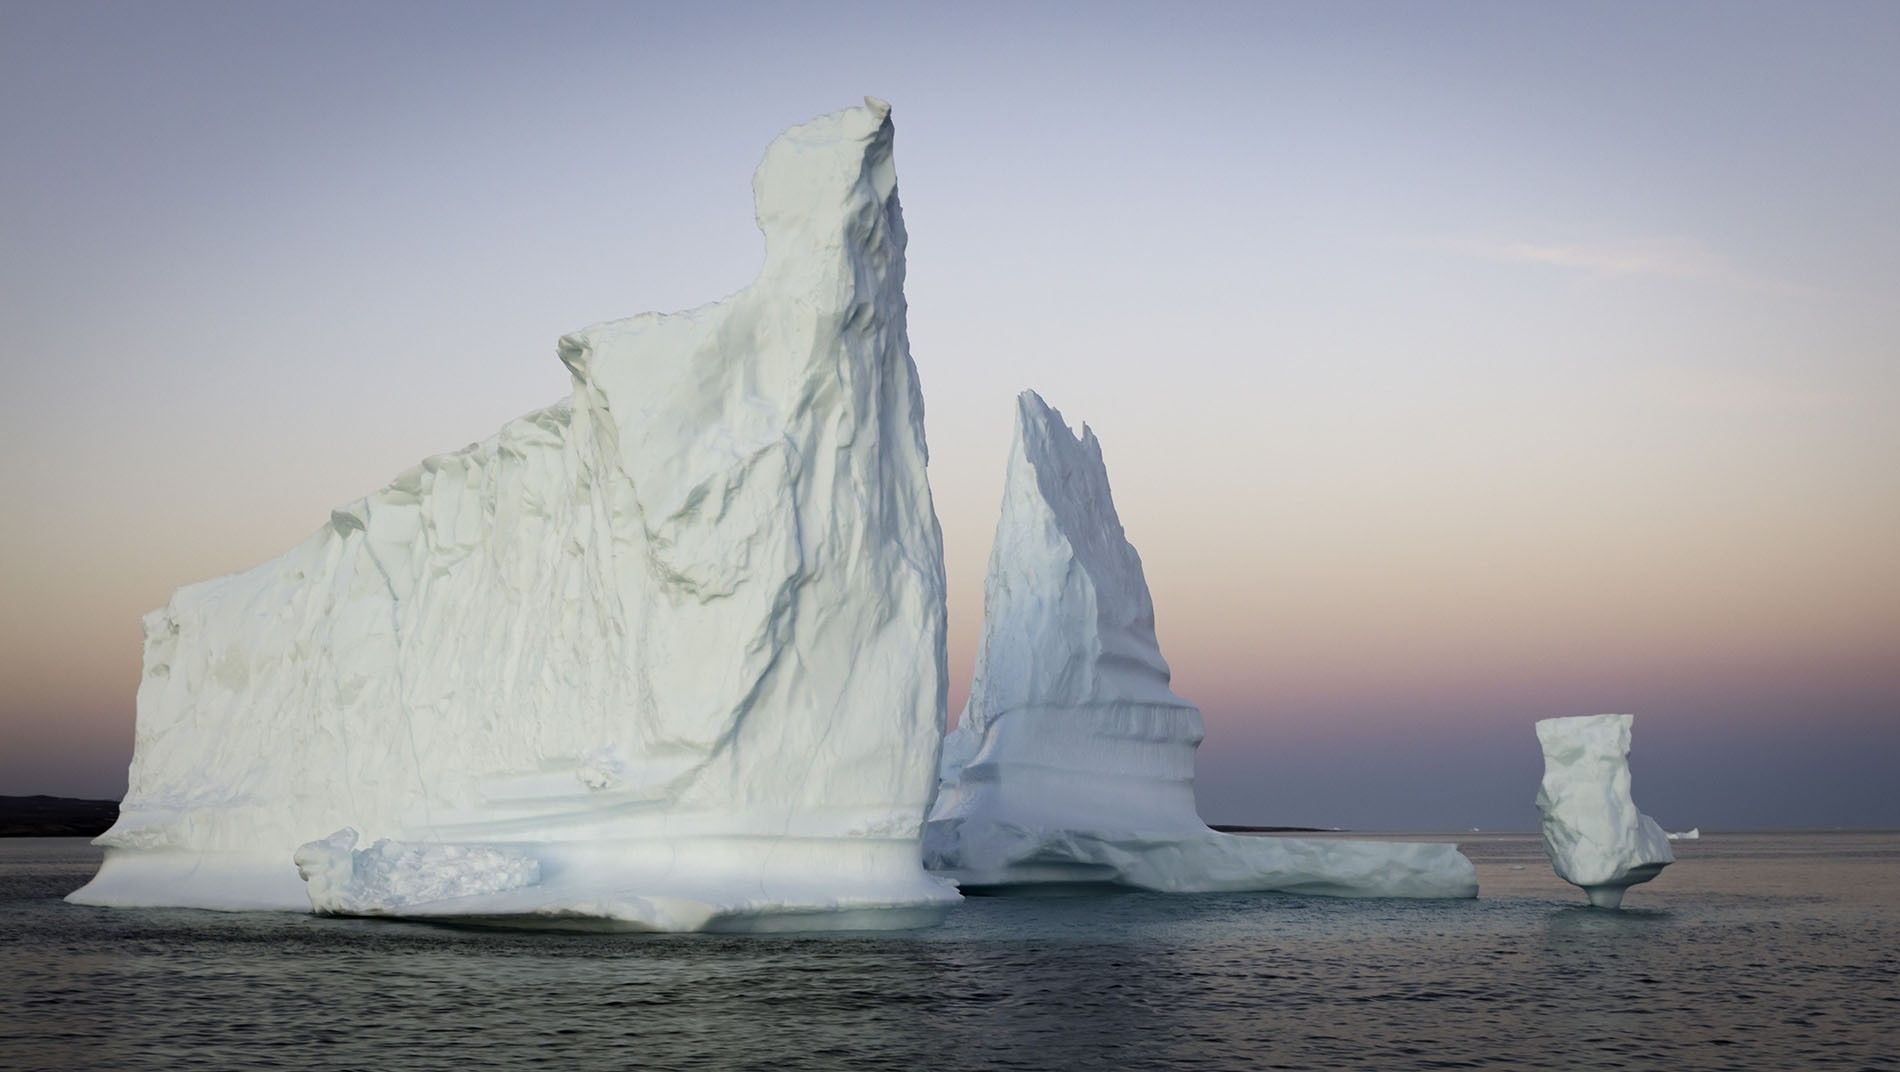 Icebergs in Greenland's Scoresby Sound.